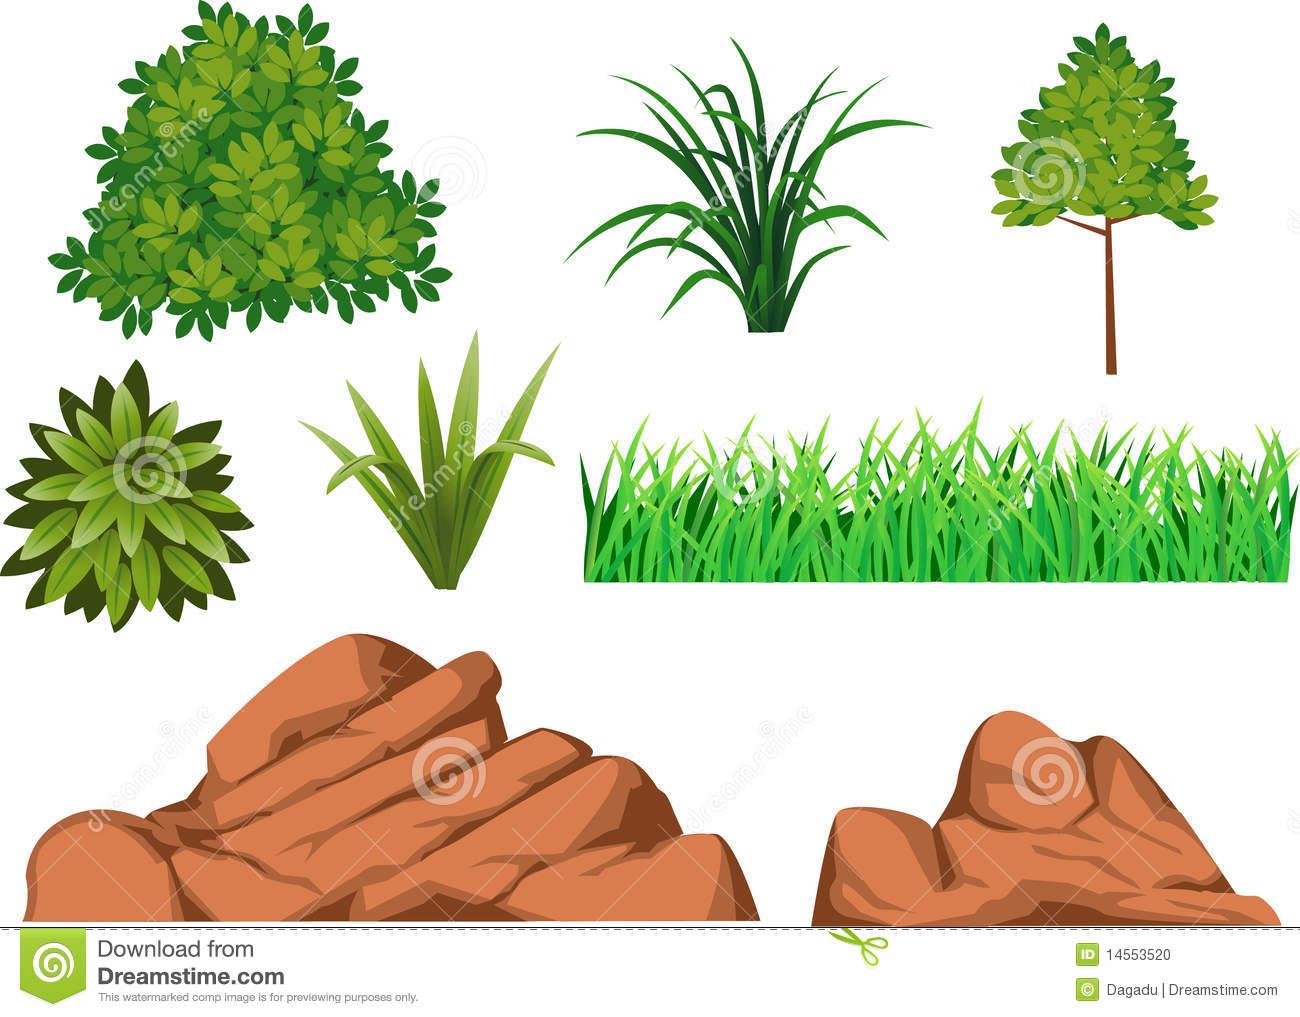 Bush grass clipart.